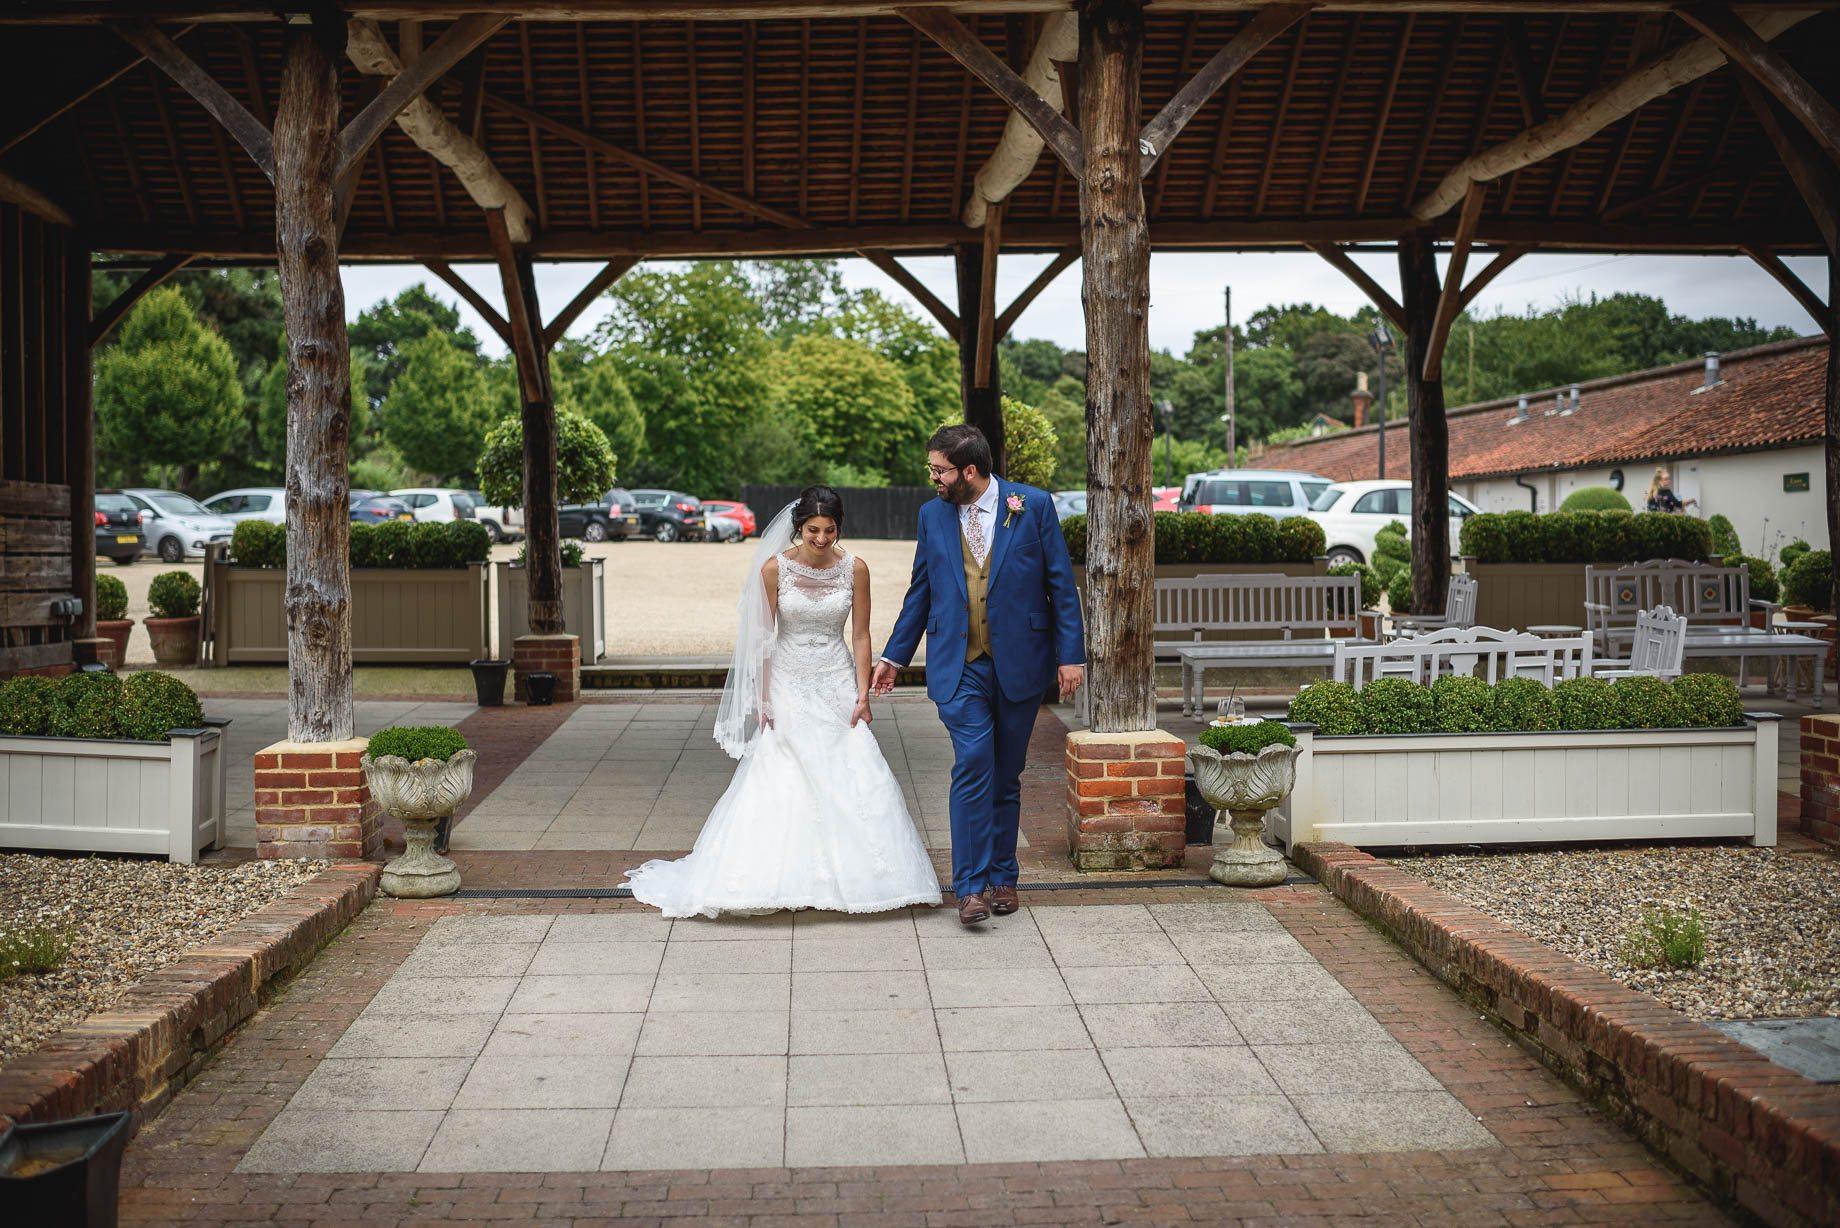 Gaynes Park wedding photography - Guy Collier Photography - Rachel and Jon (110 of 169)